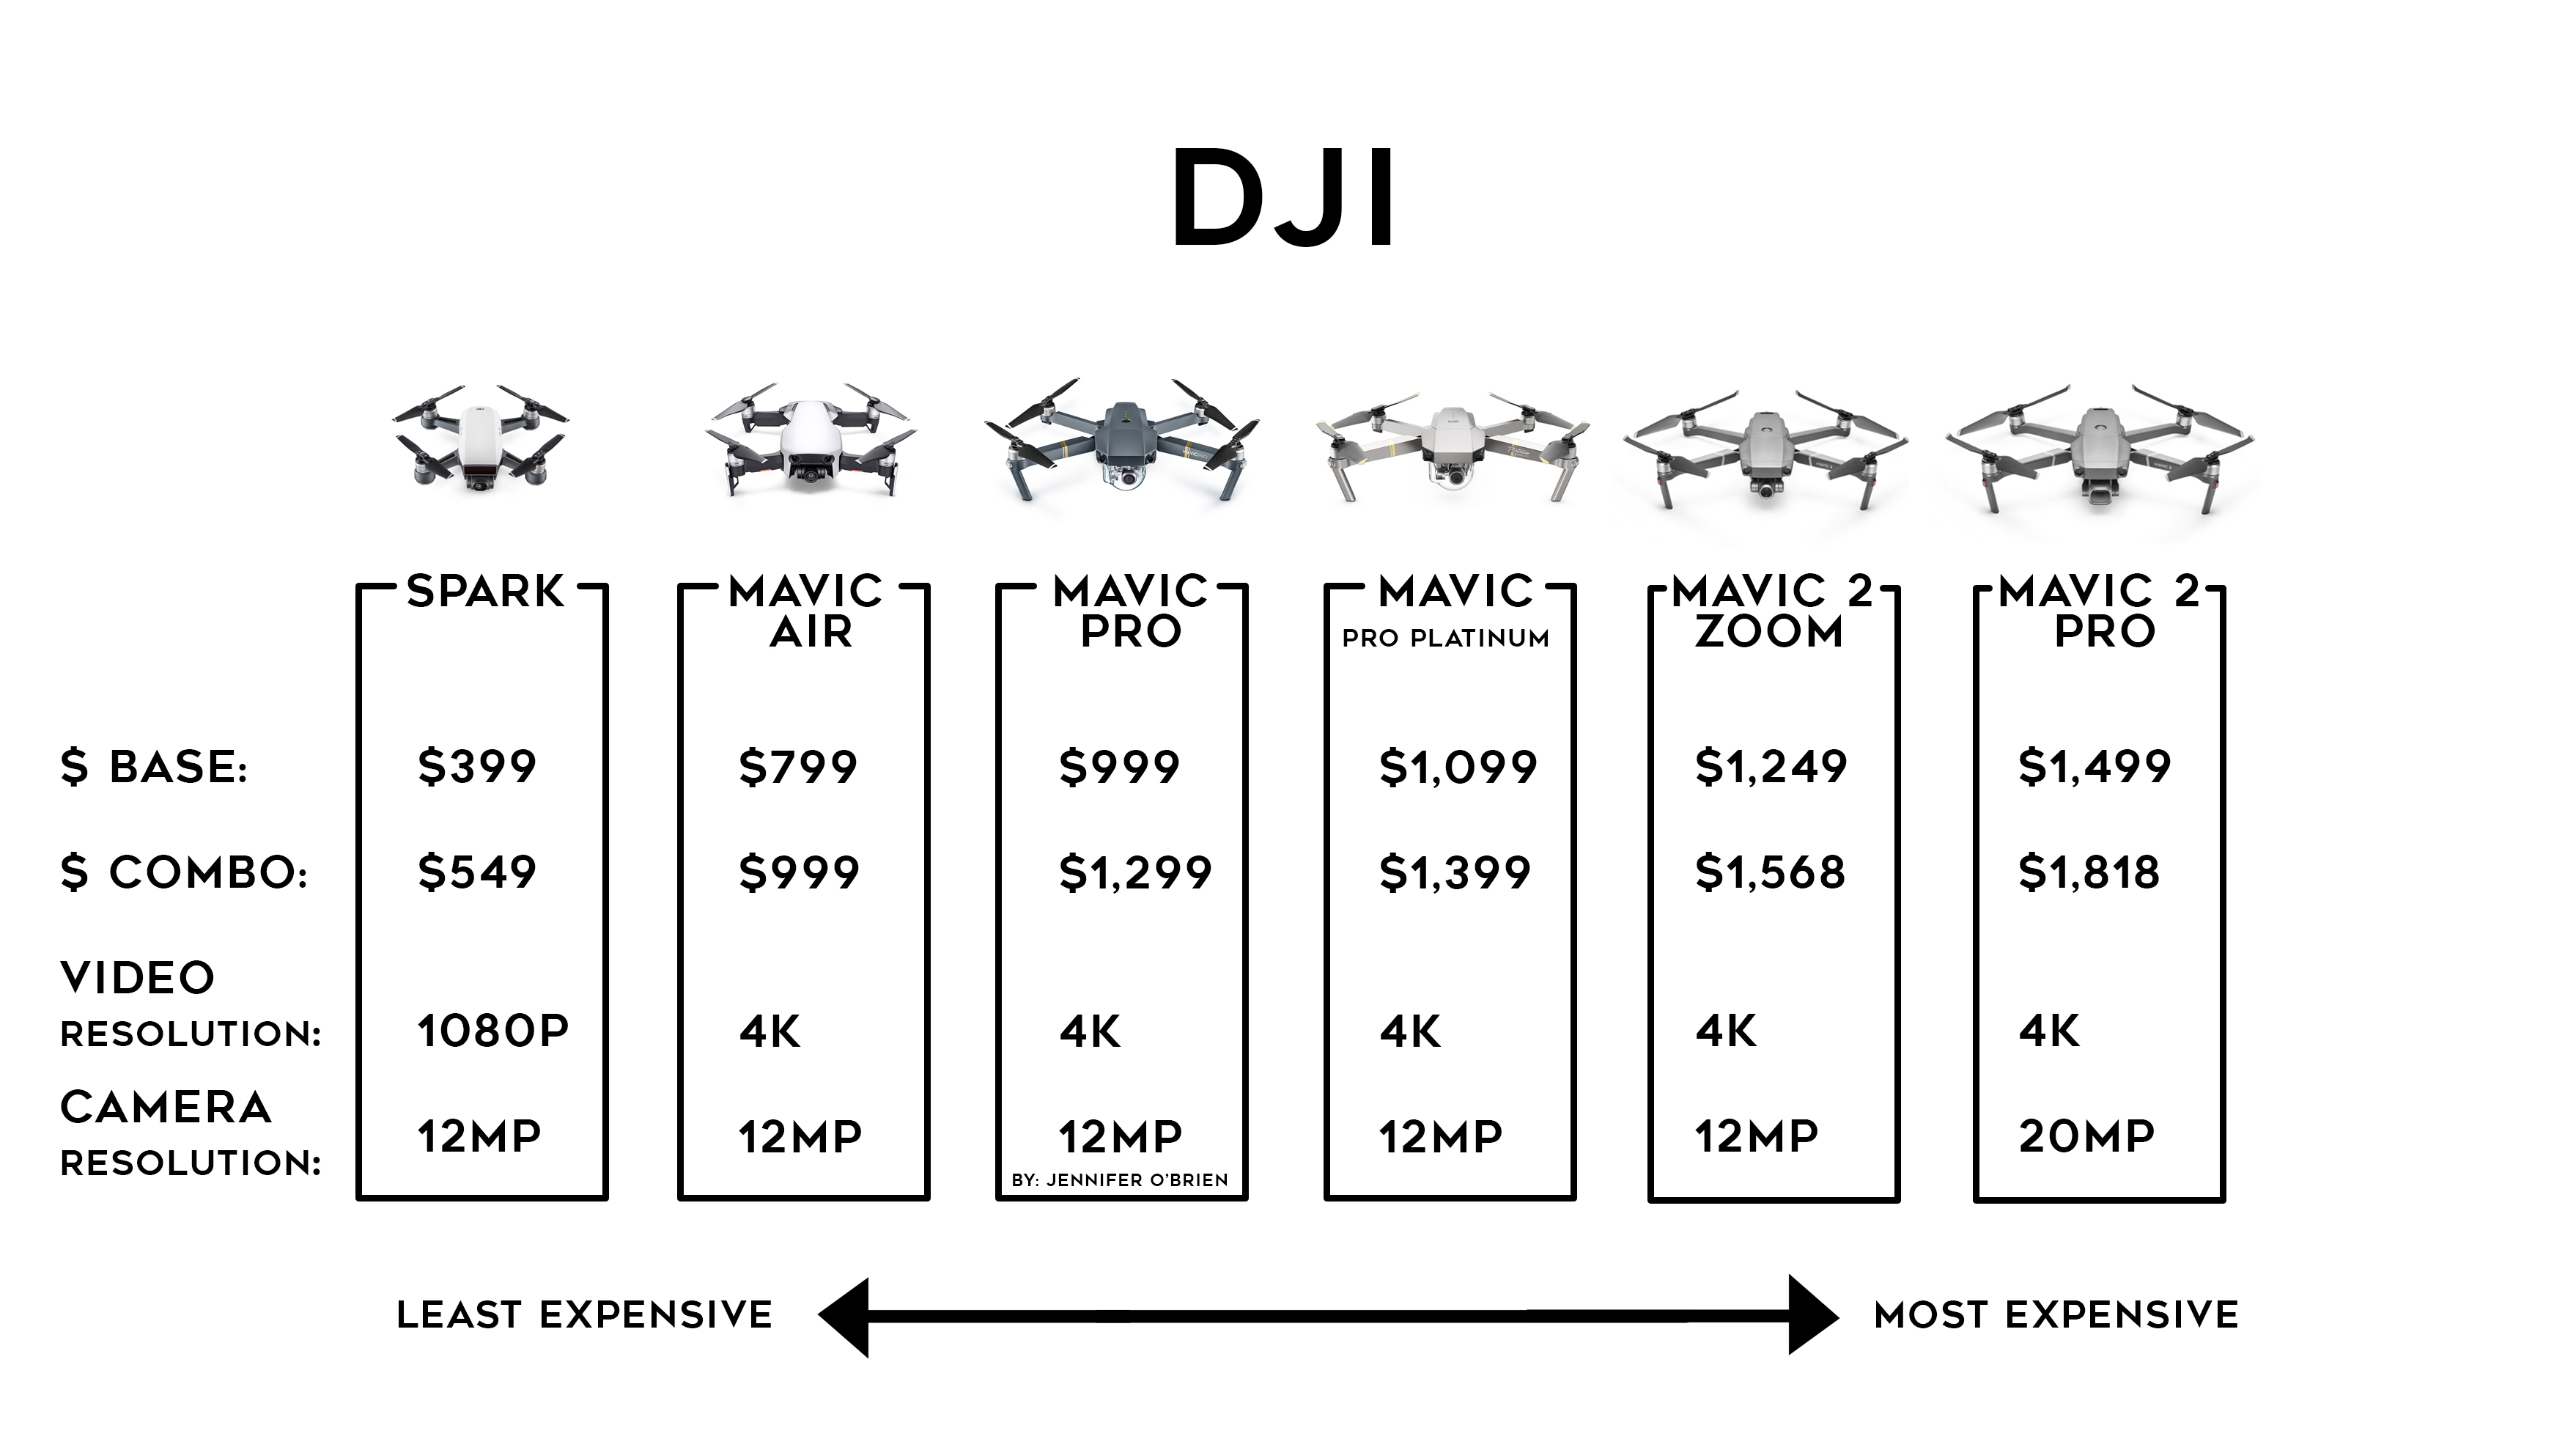 DJI Mavic 2 Pro Mavic 2 Zoom buying chart travel drone guide for beginners